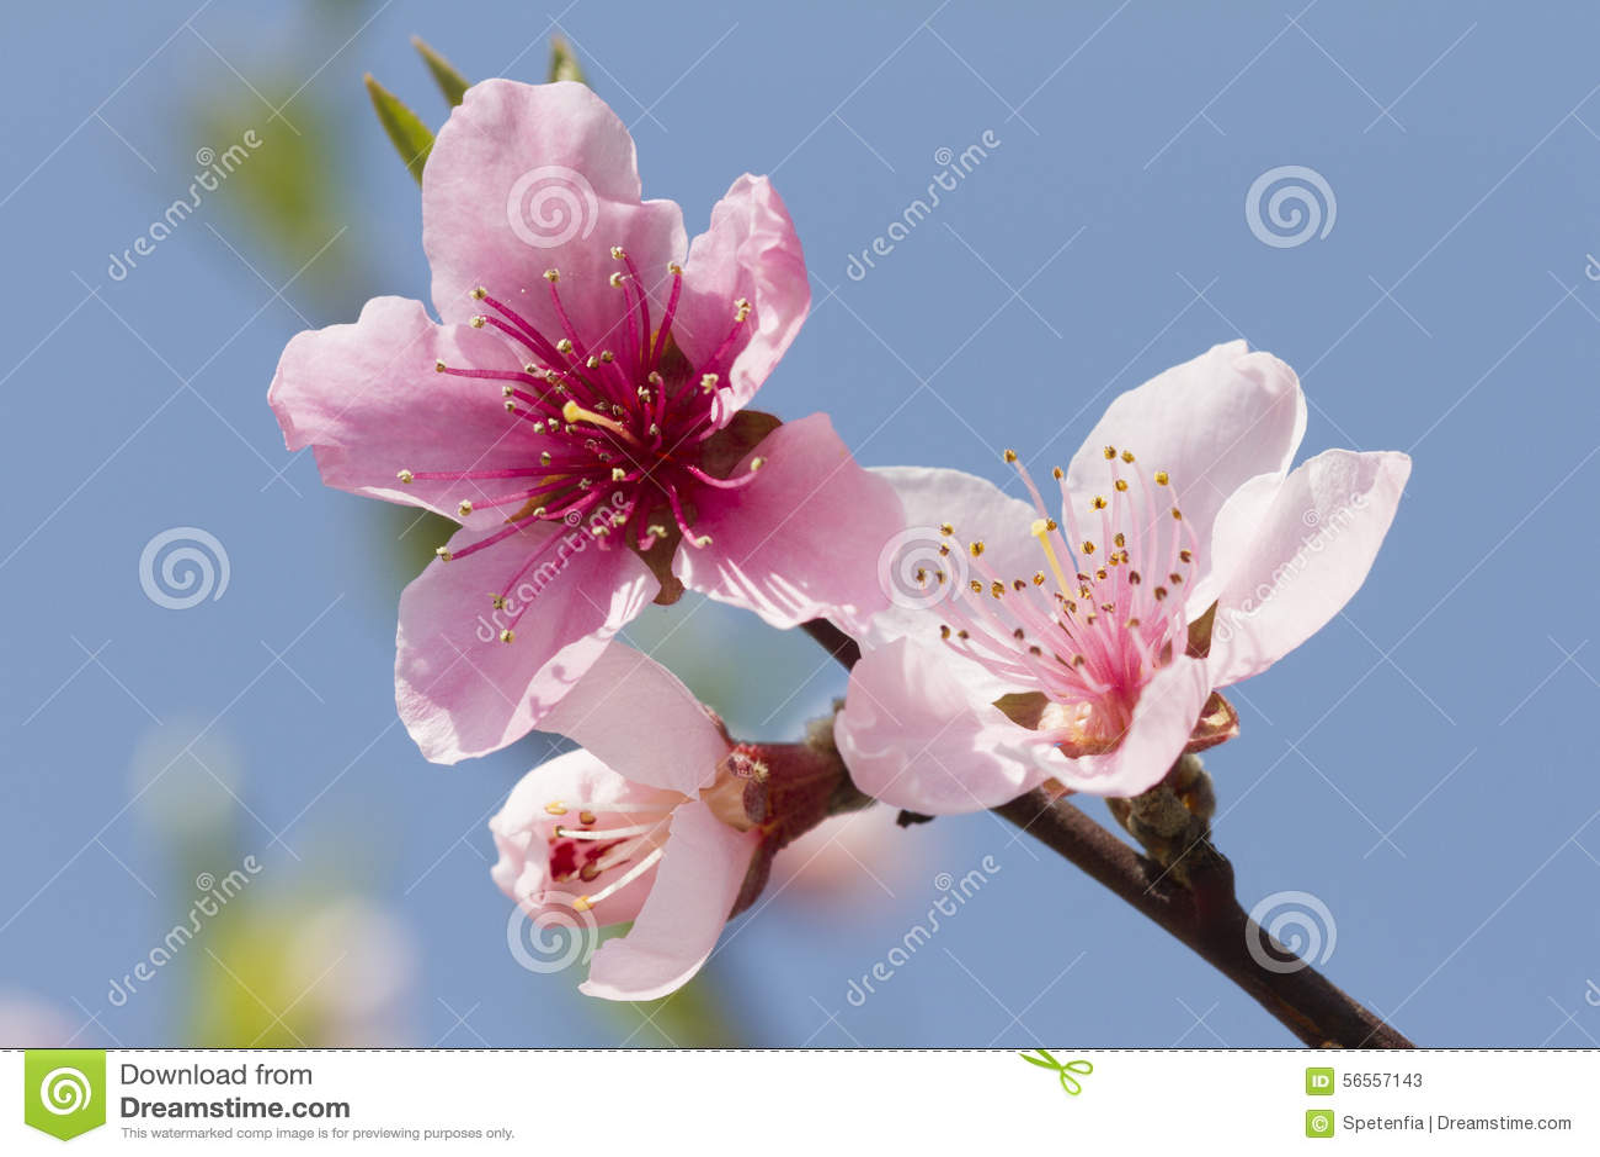 Download Λουλούδι ροδάκινων στο δέντρο Στοκ Εικόνα - εικόνα από bloodsuckers, οίστρο: 56557143